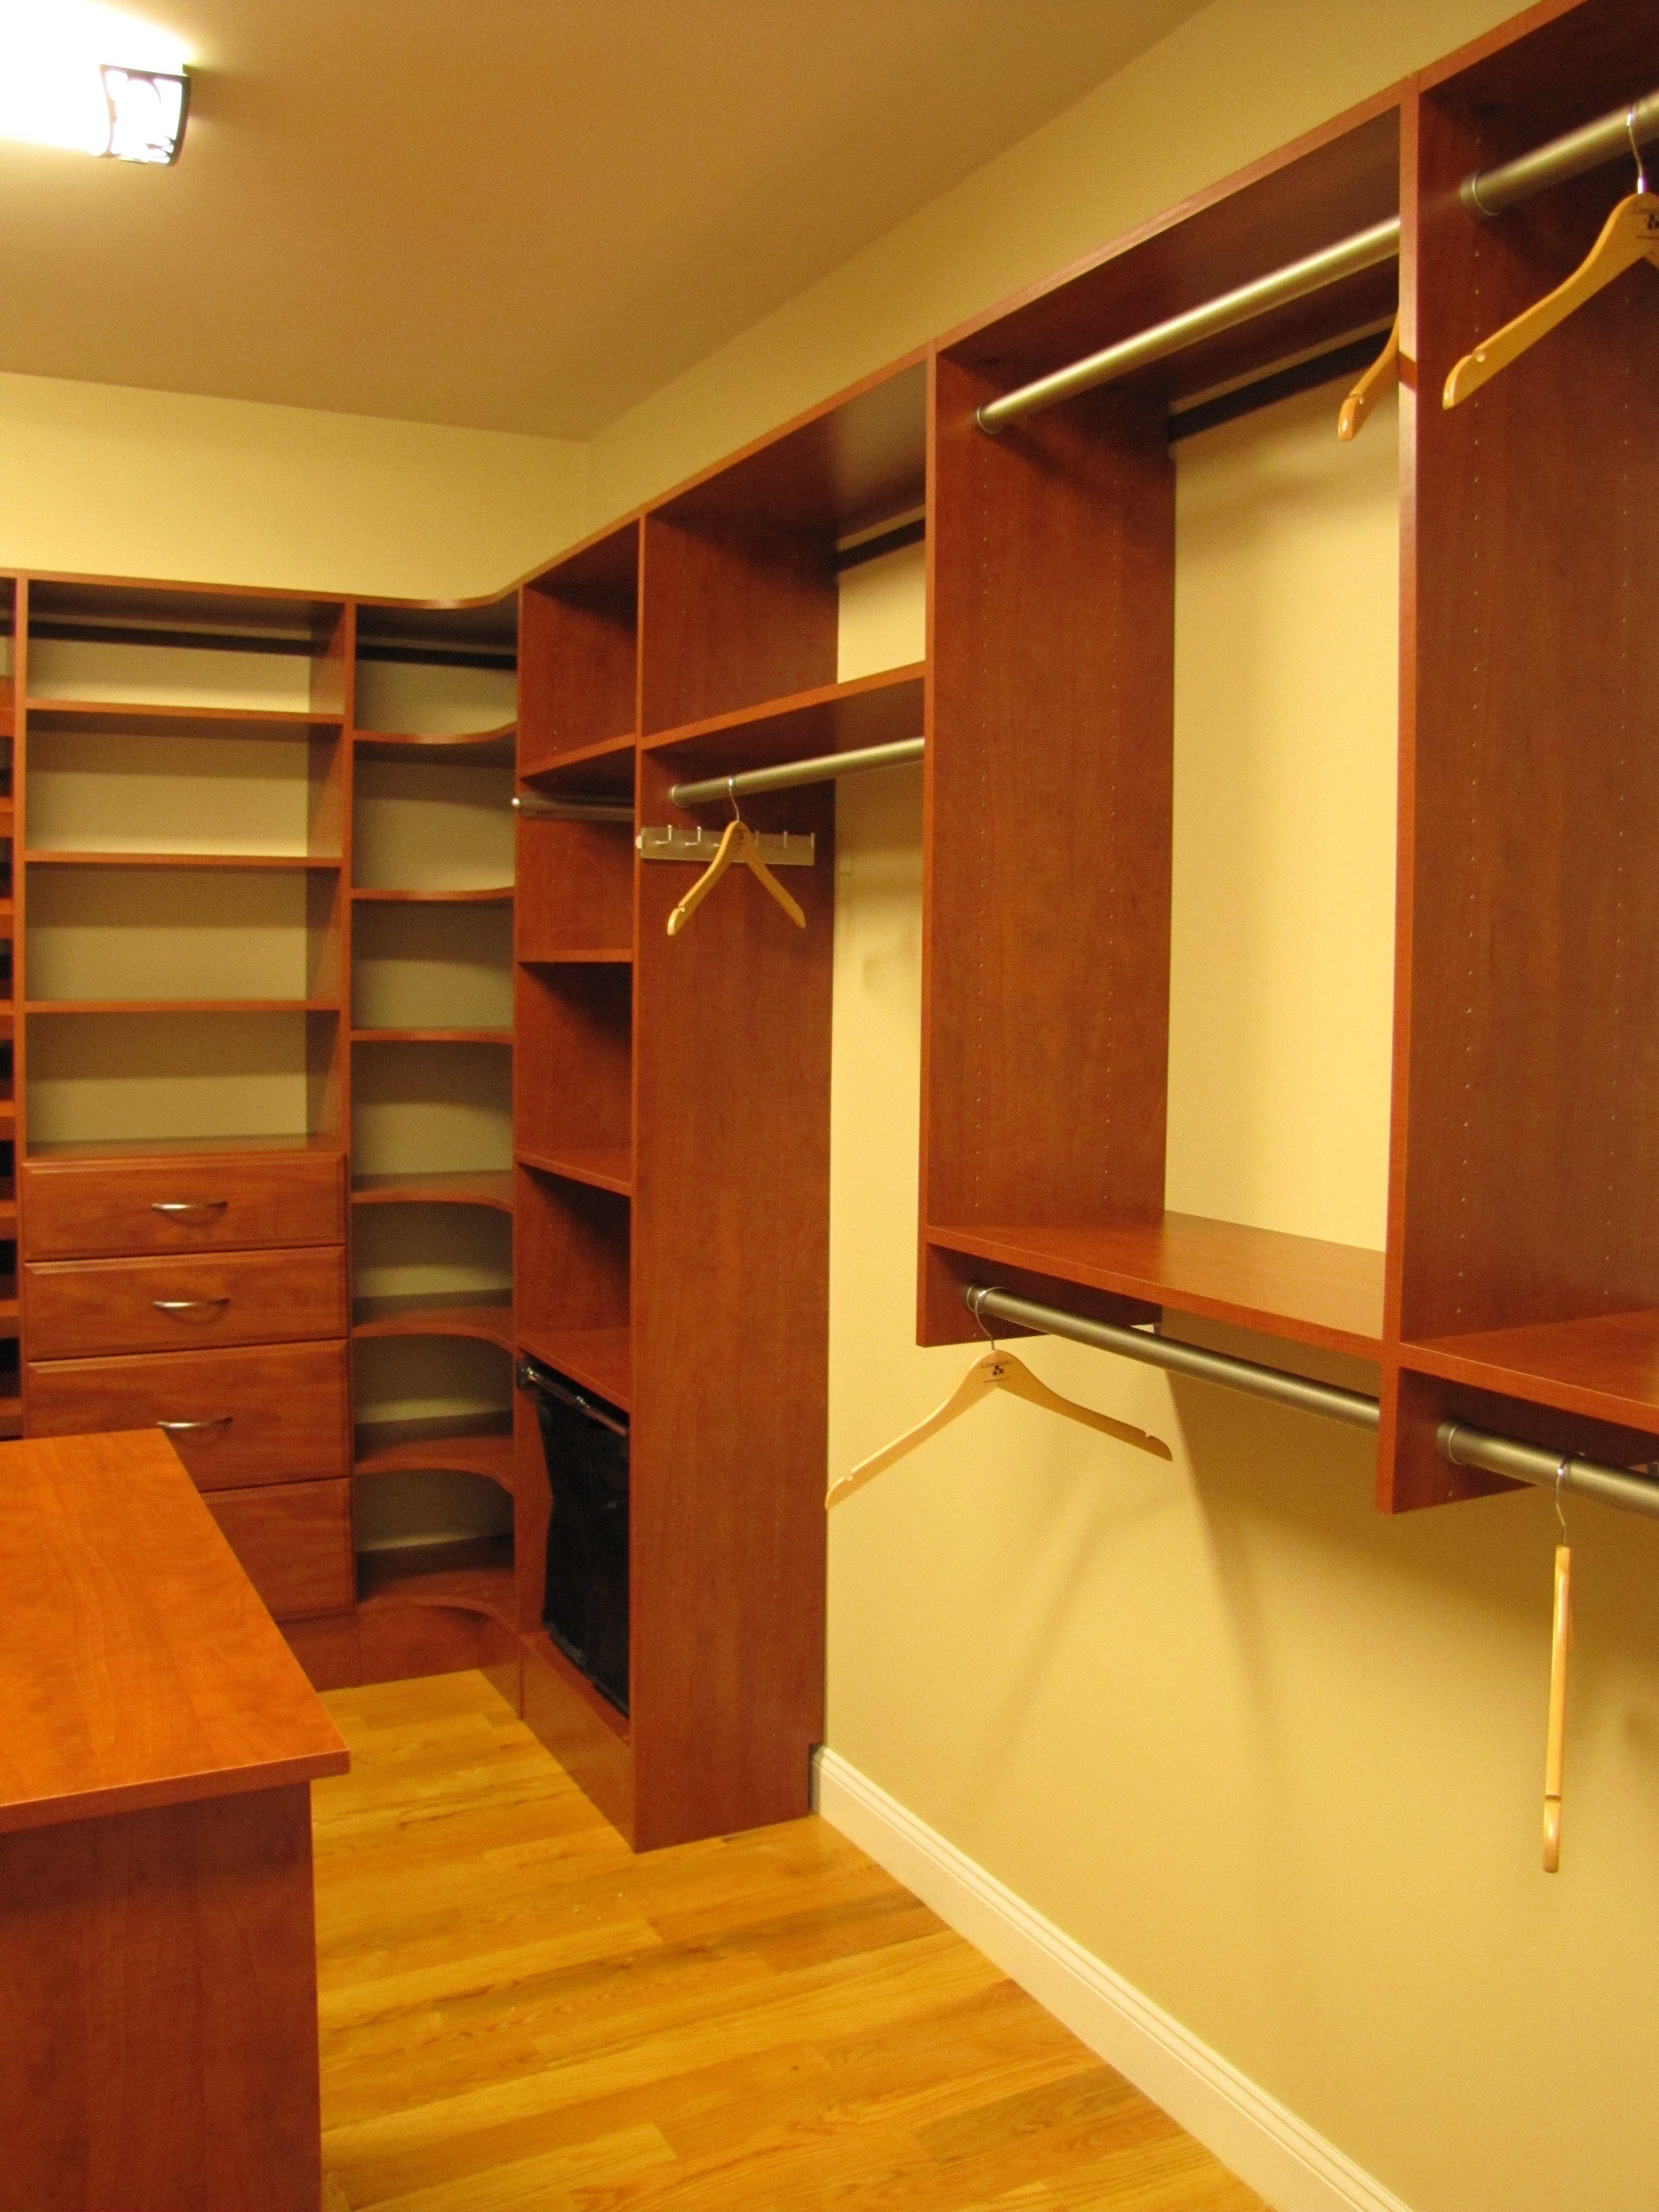 Etonnant Walk In Closets | Reach In Closets | Optimized Closet Design | Closets Etc